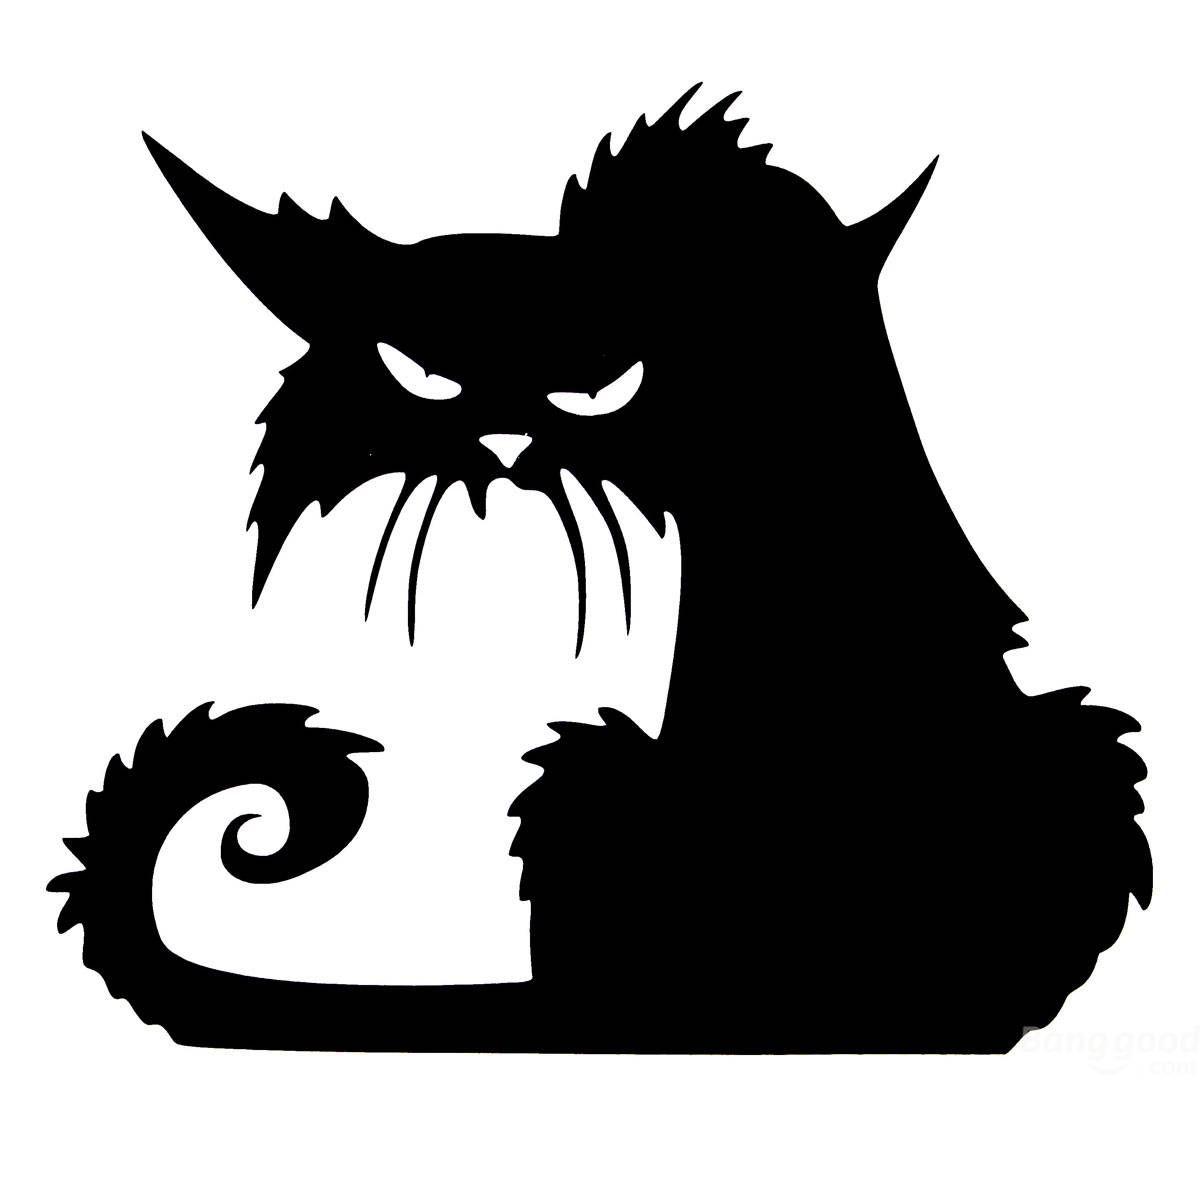 Halloween Scary Black Cat Glass Sticker Halloween Decor.